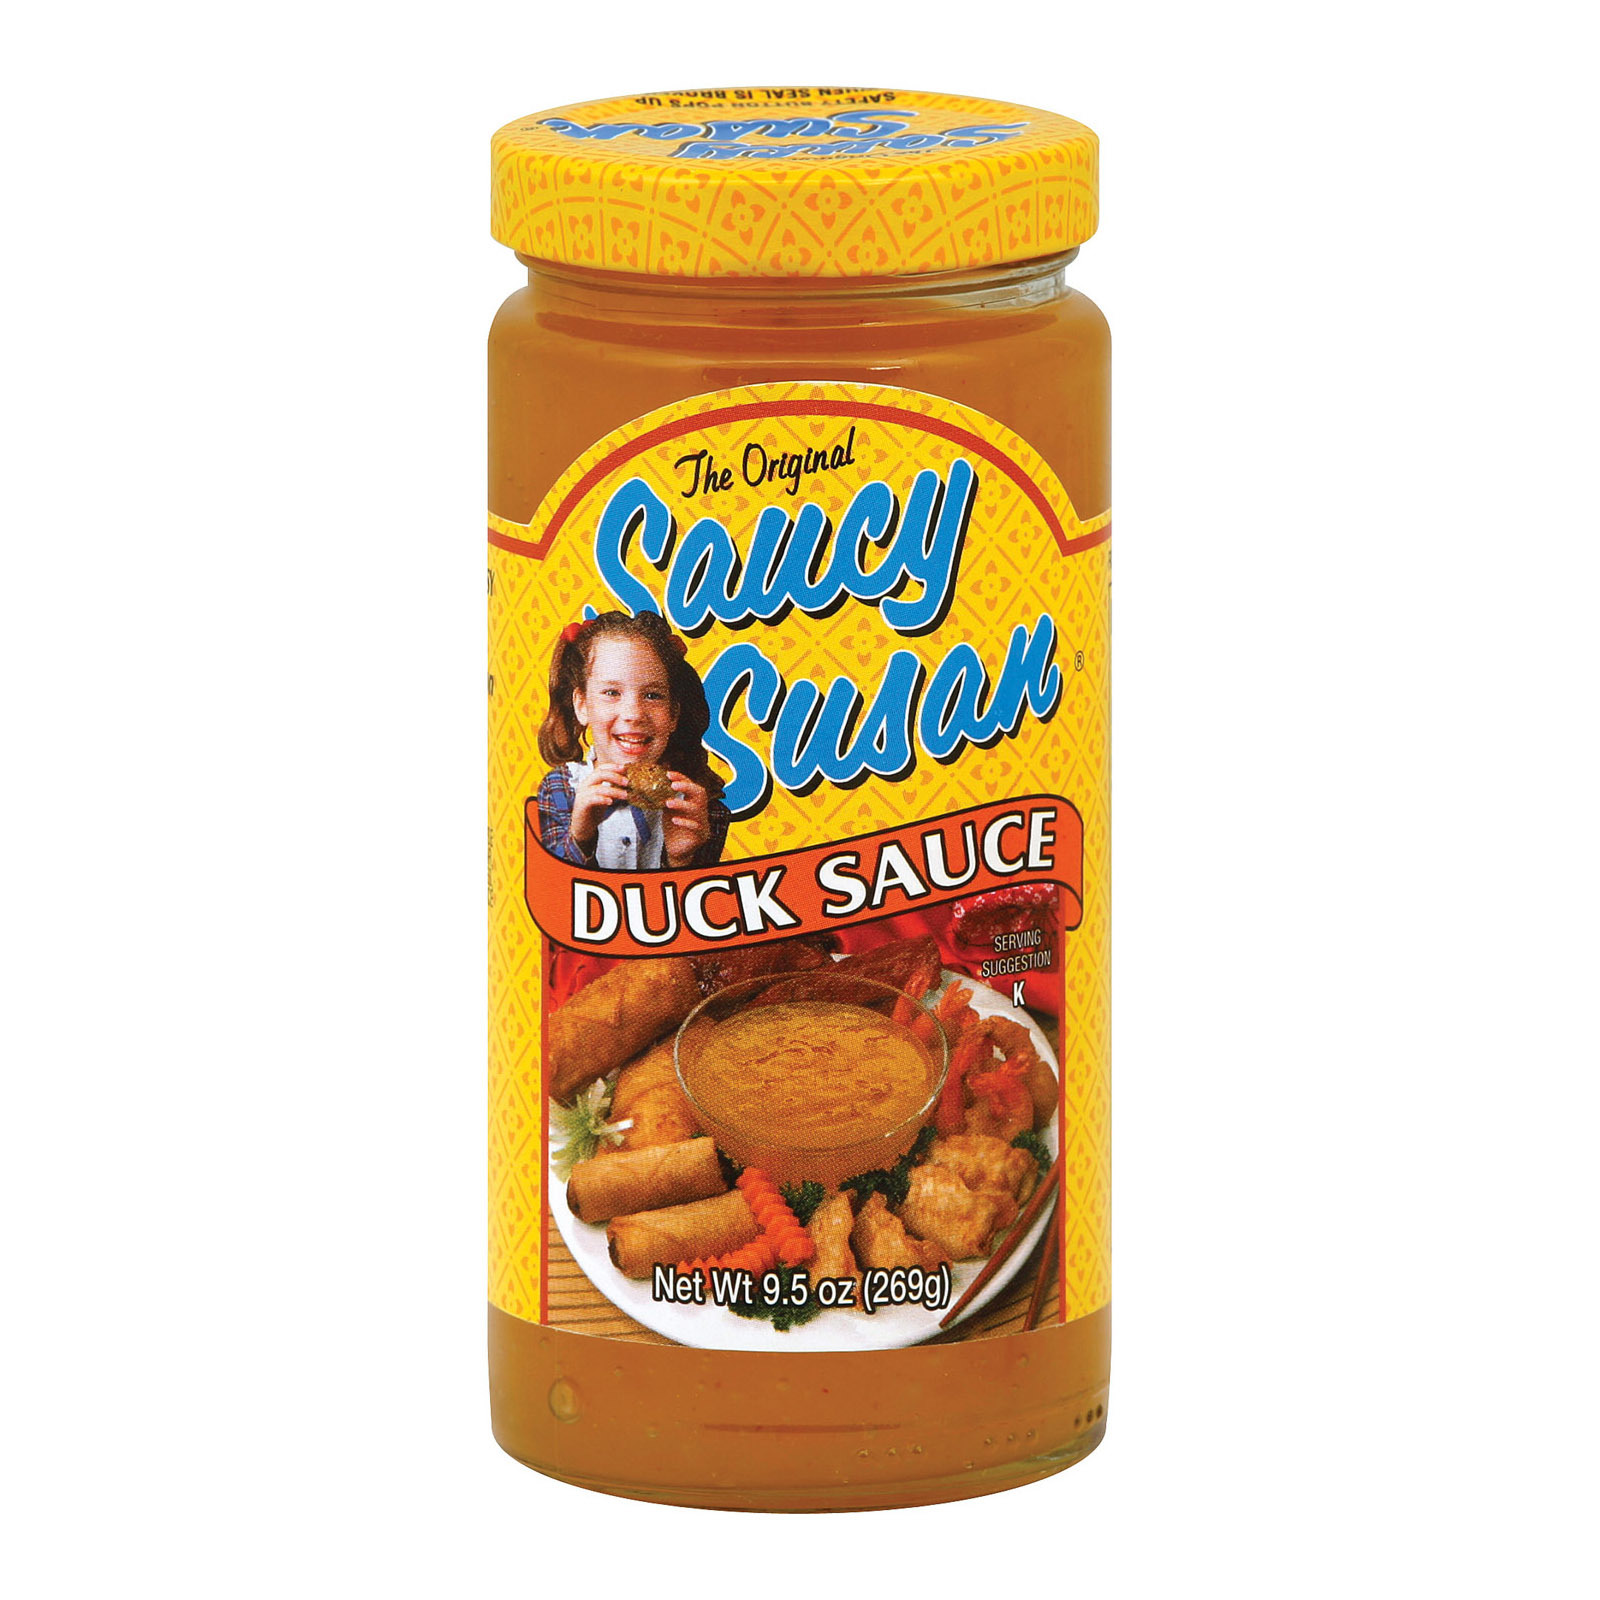 Saucy Susan Original Sauce - Peking Duck - Case of 12 - 9.5 oz.